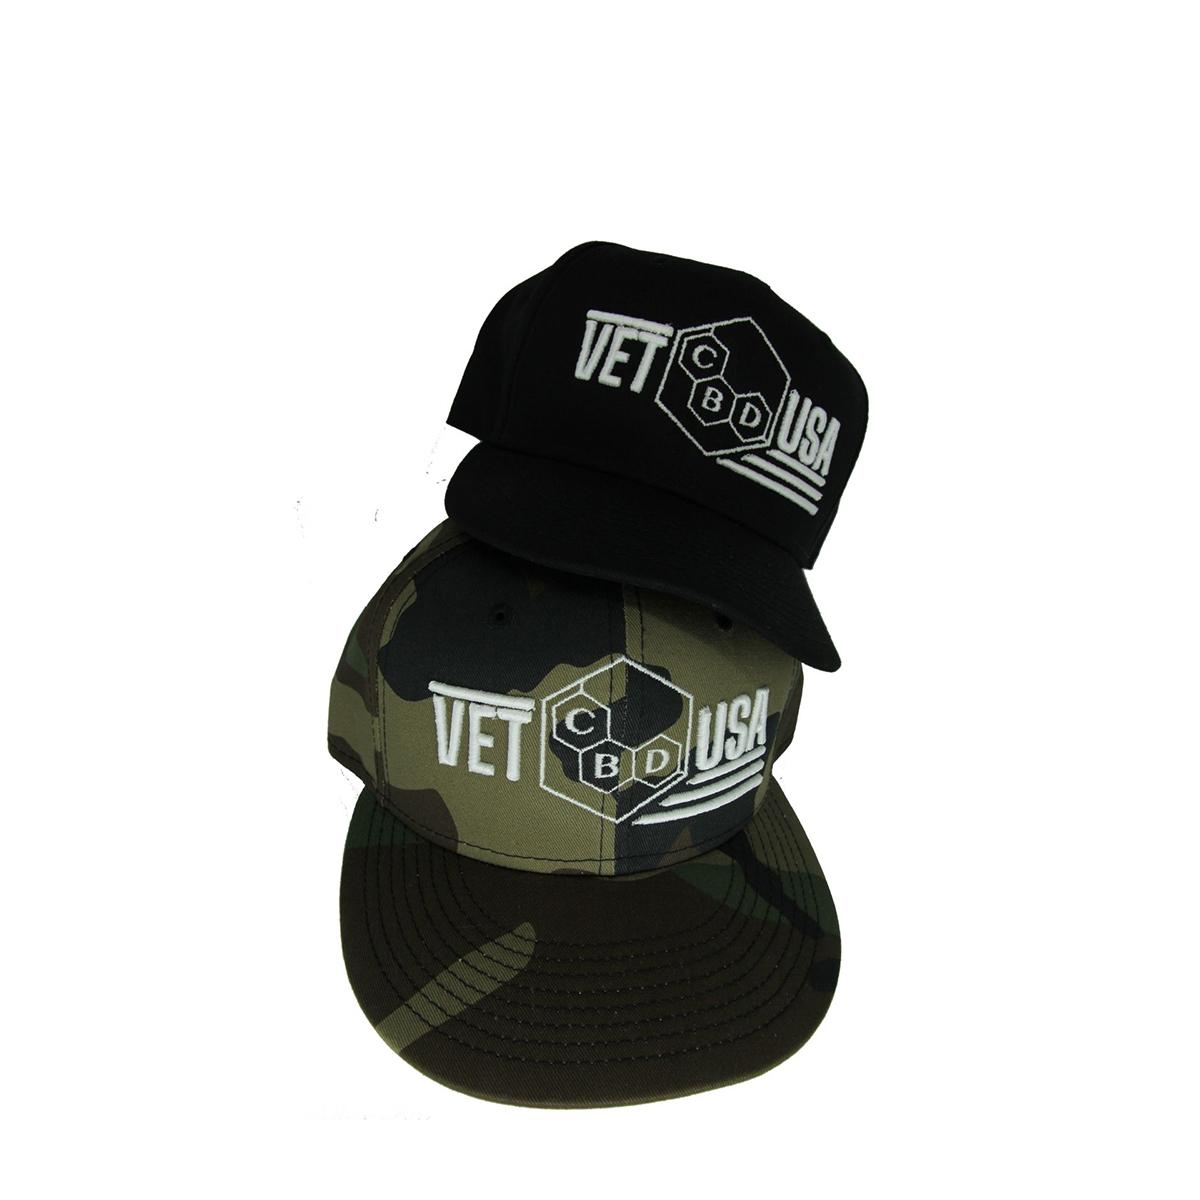 VET CBD USA Hat